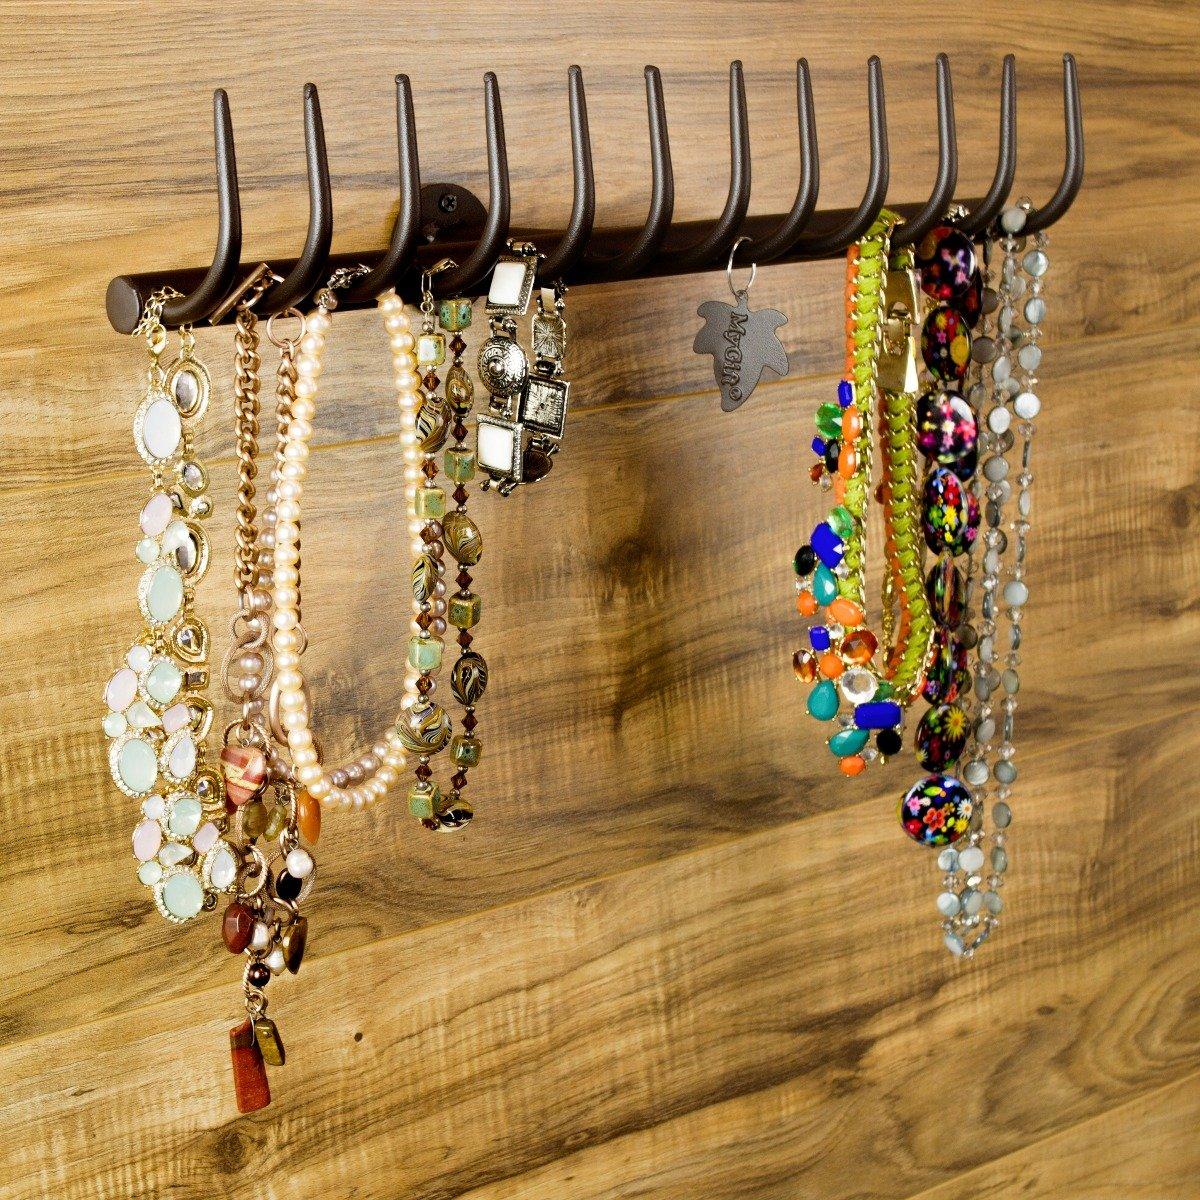 12-Hook Country Garden Rake Design Wall Mounted Metal Jewelry Storage Rack / Necklace Organizer, Brown